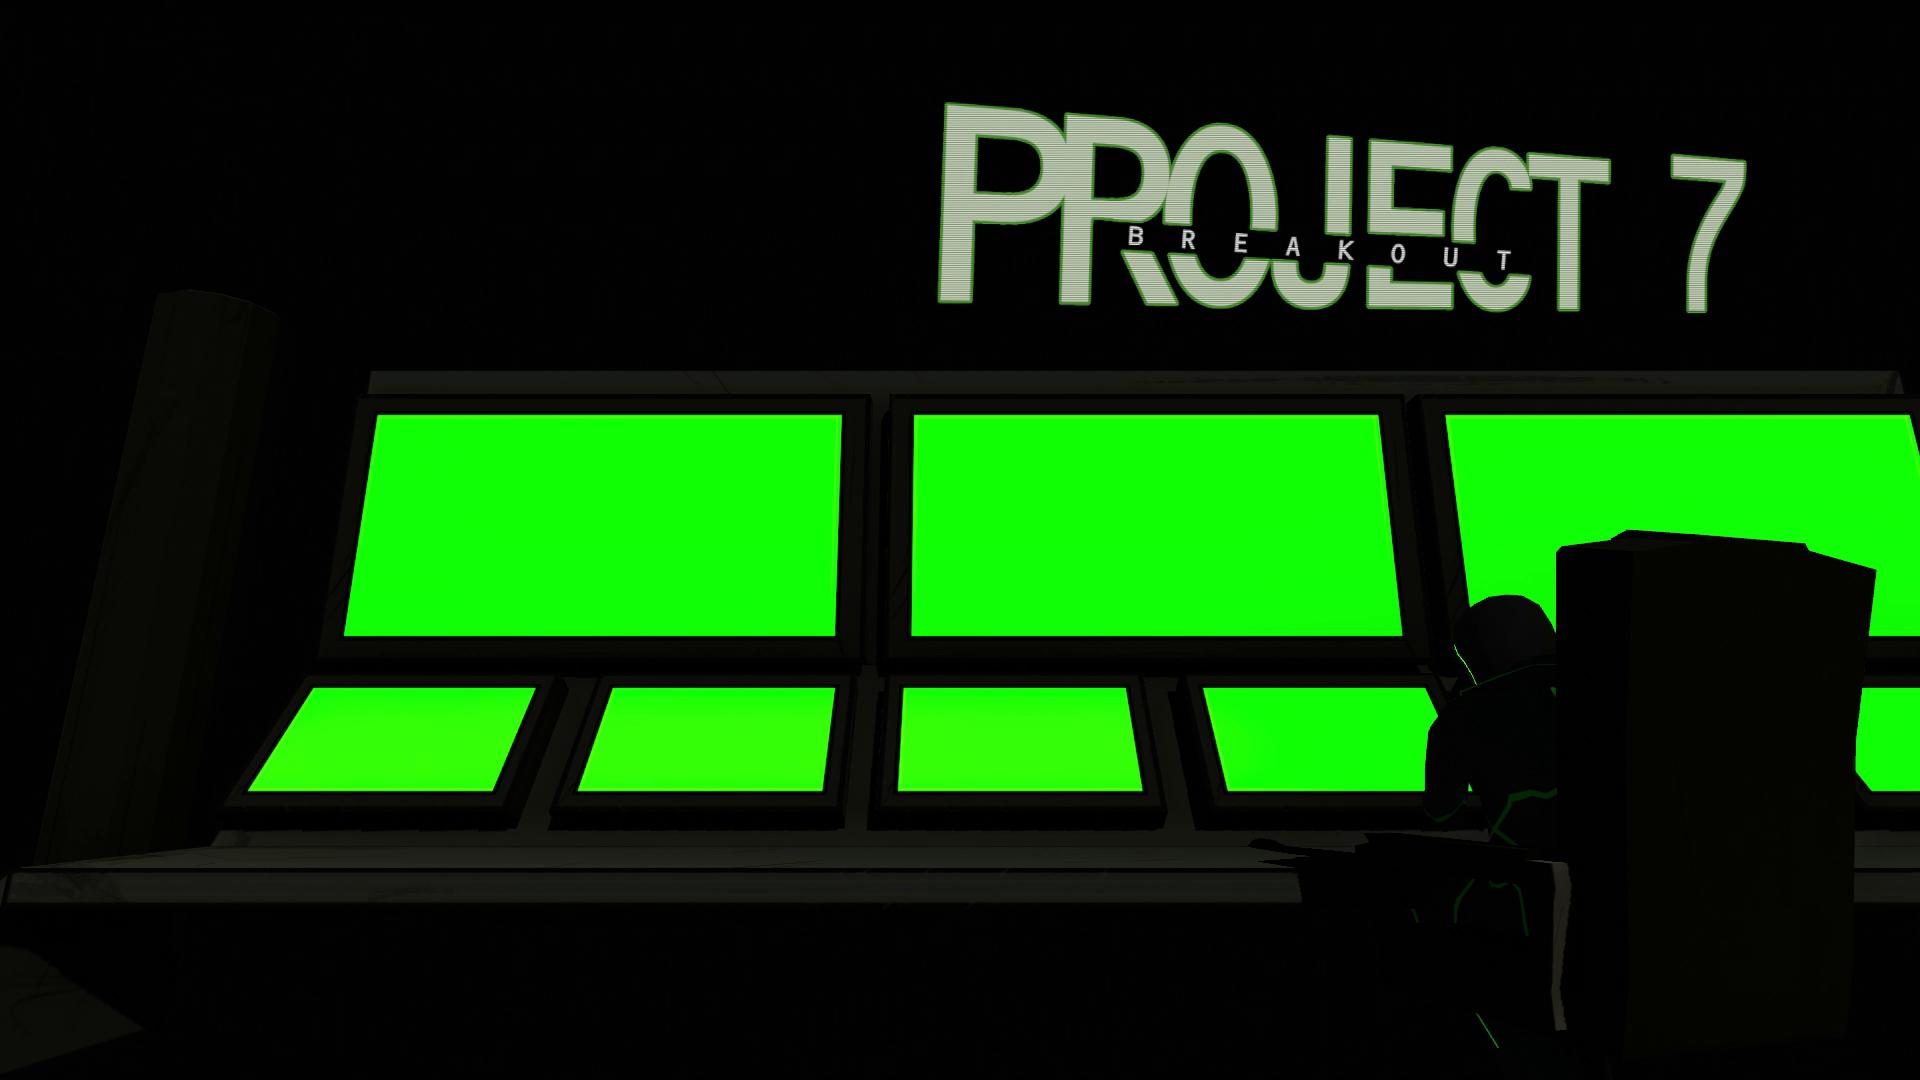 Project 7: Breakout